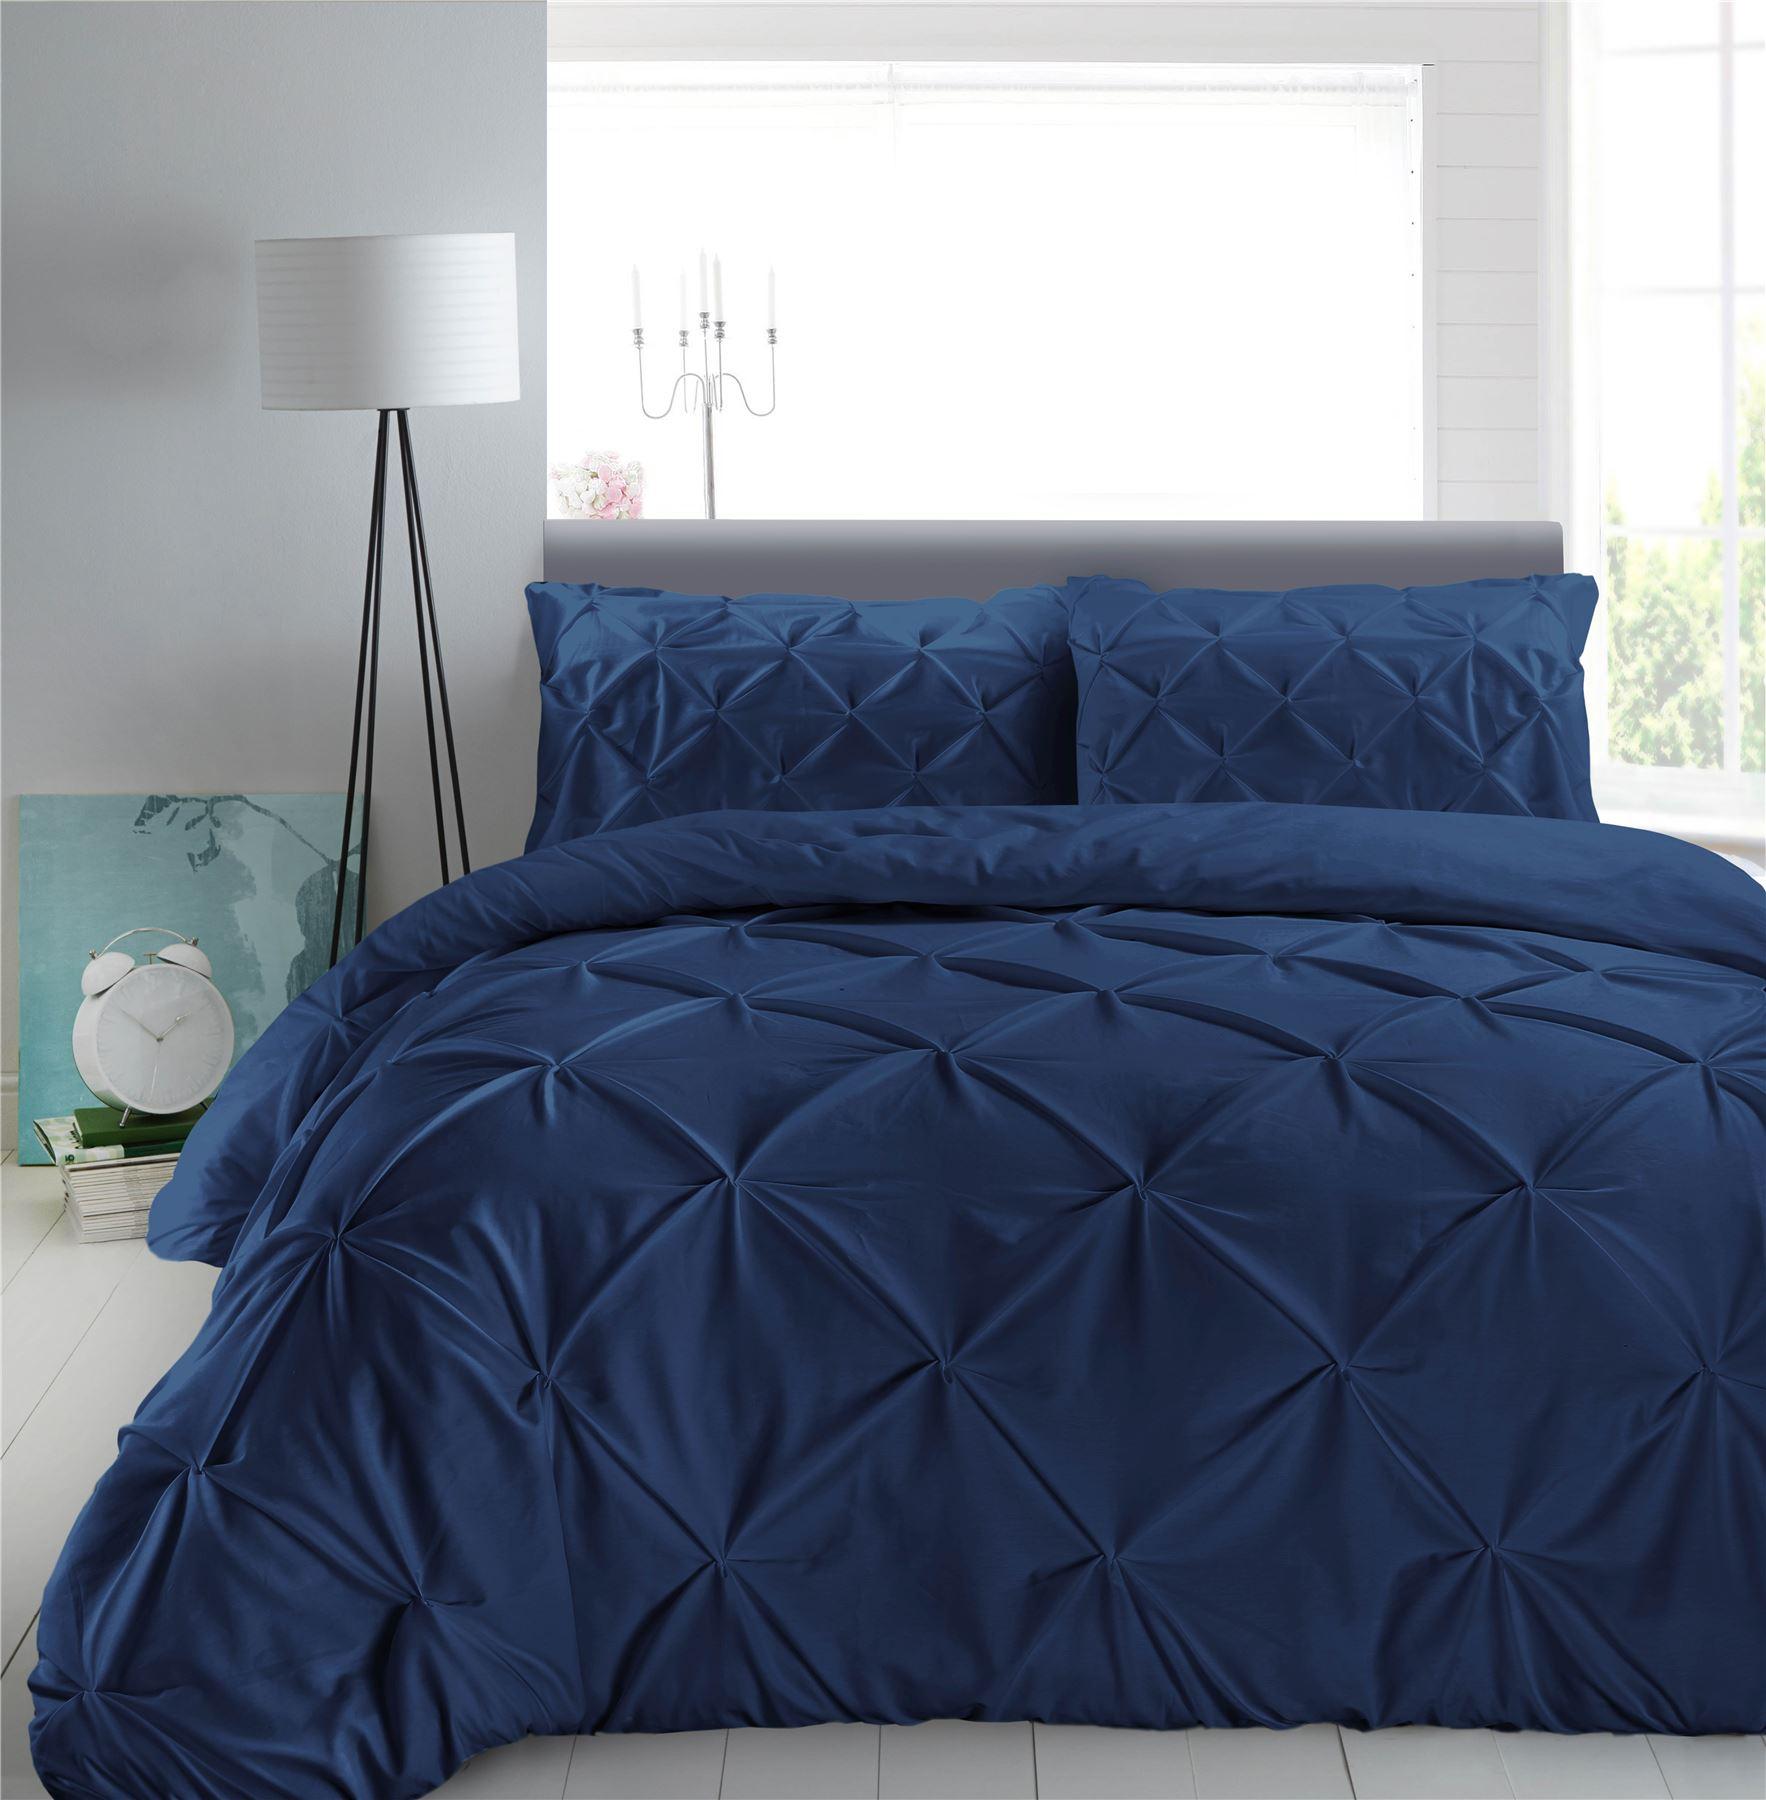 Luxury-Pure-100-Cotton-200-Thread-Pinch-Pleat-Pintuck-Puckering-Duvet-Cover-Set thumbnail 22